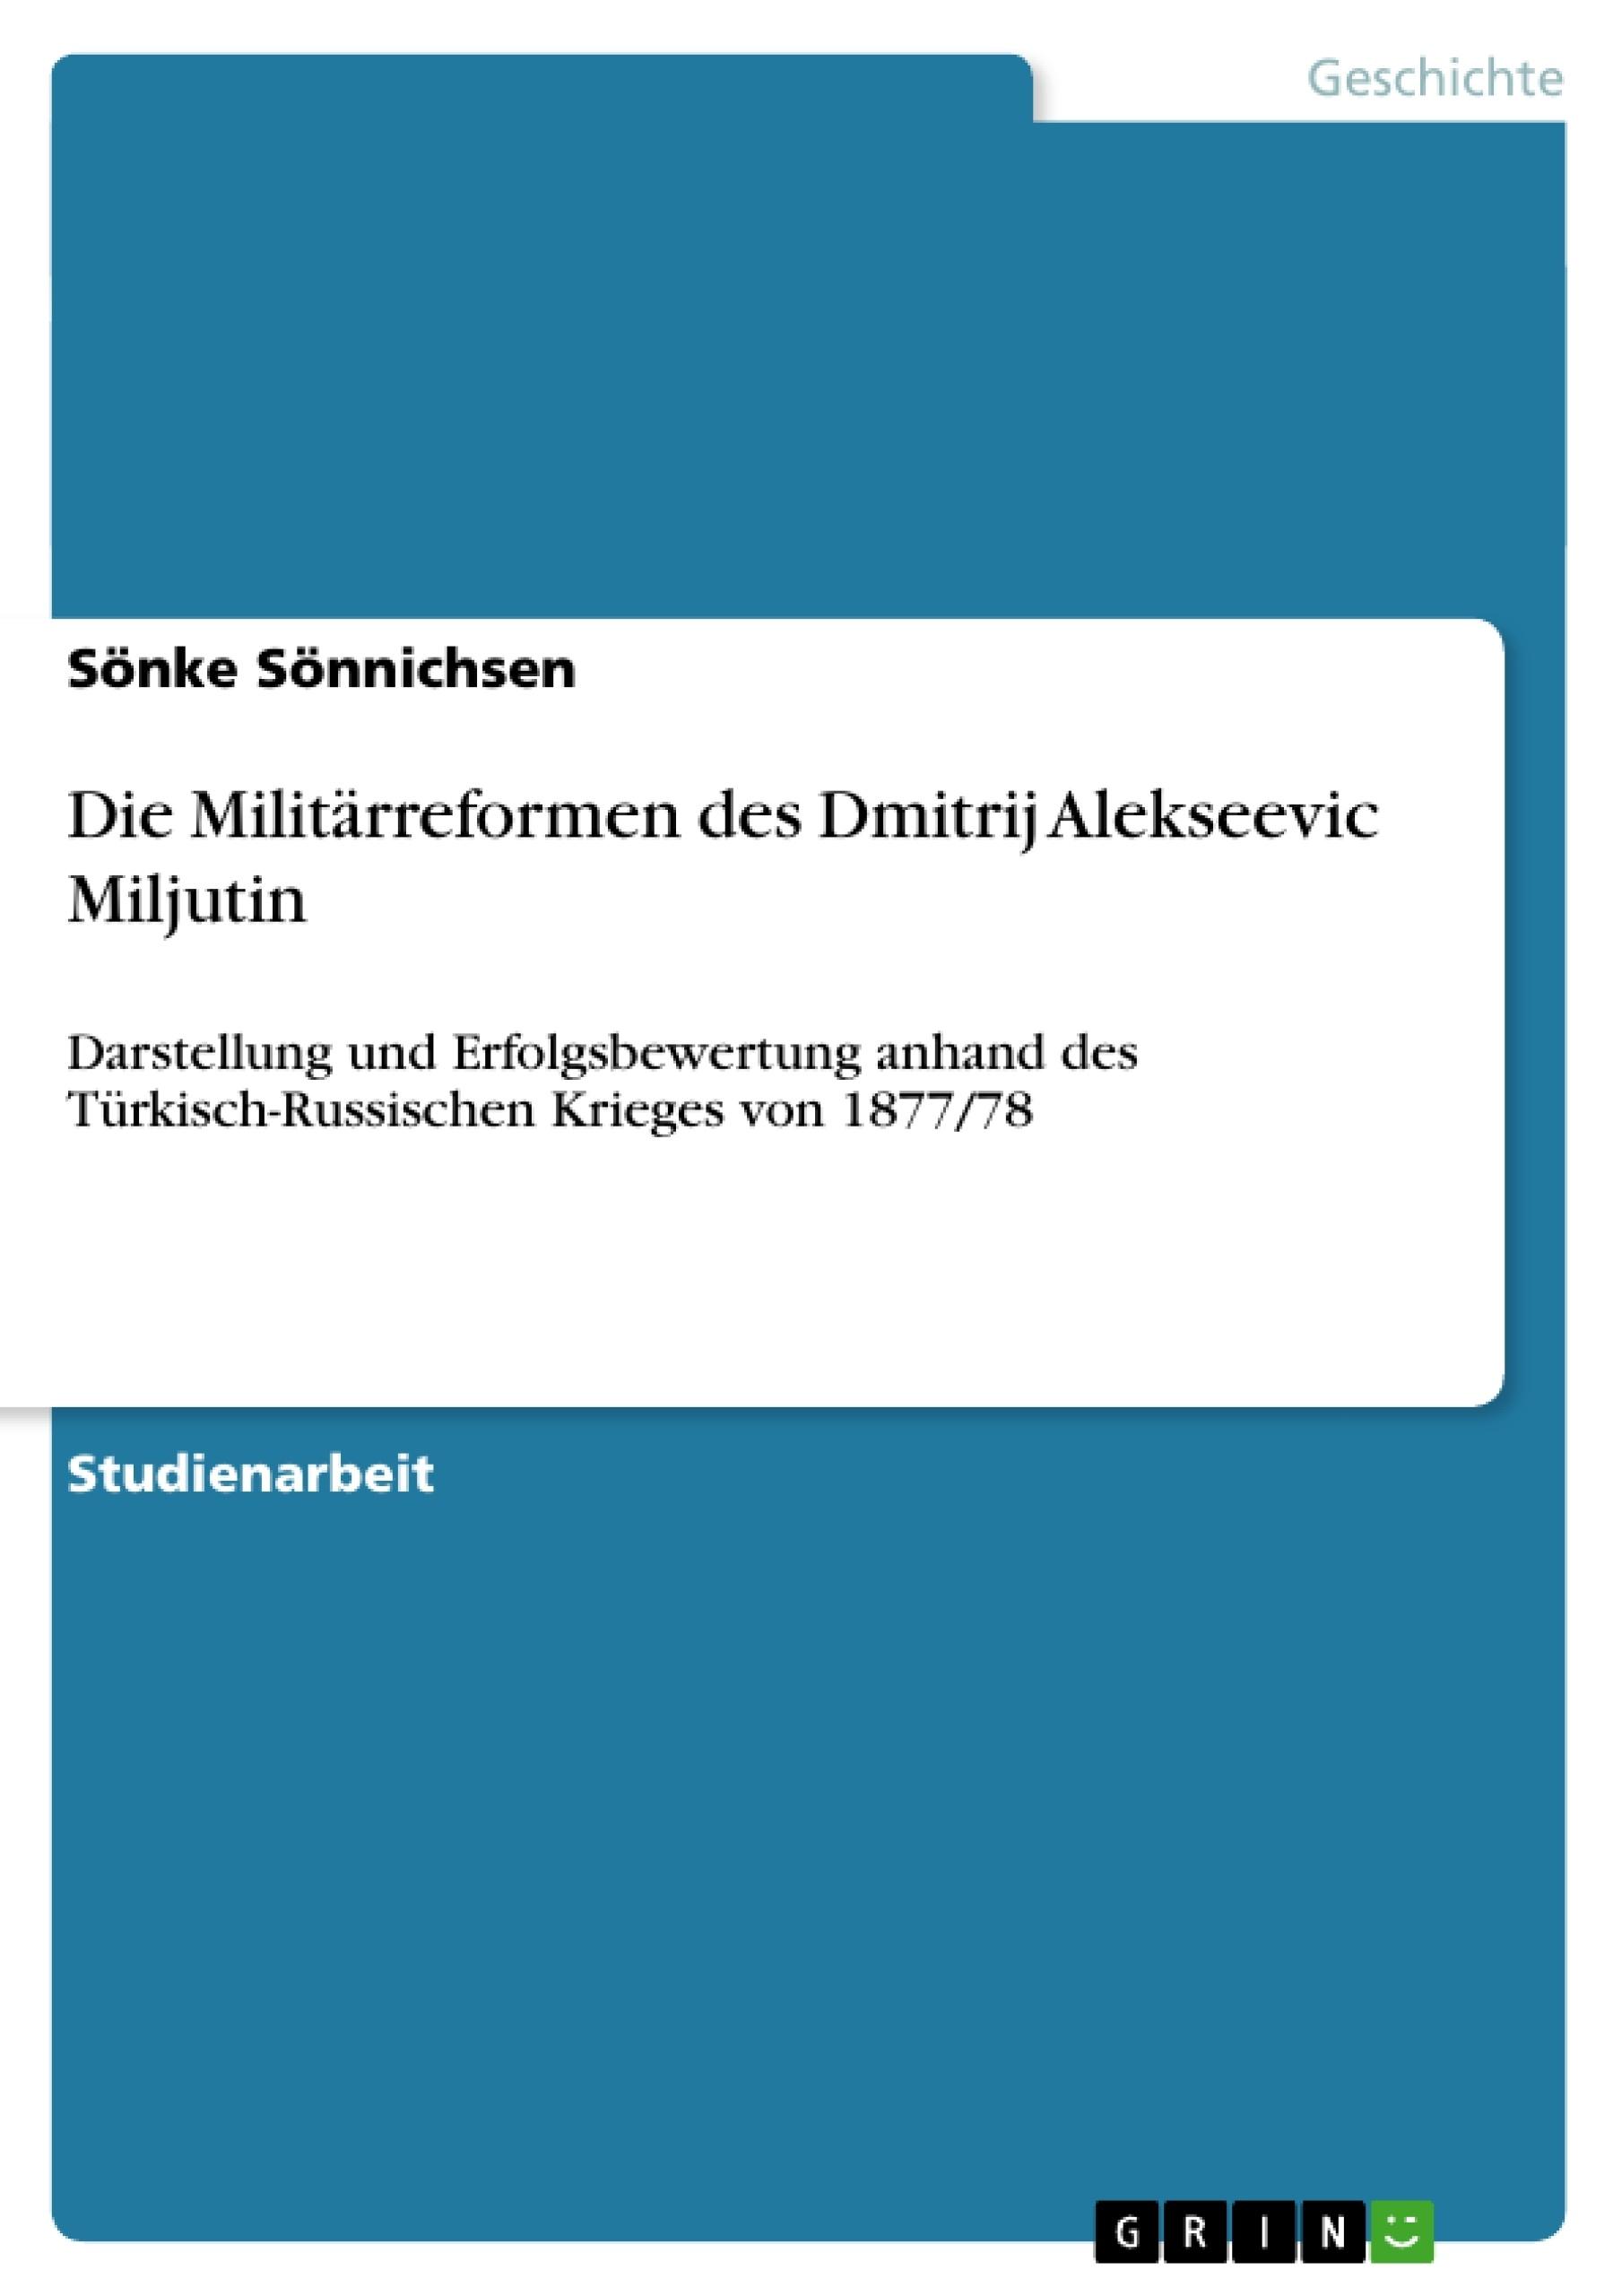 Titel: Die Militärreformen des Dmitrij Alekseevic Miljutin